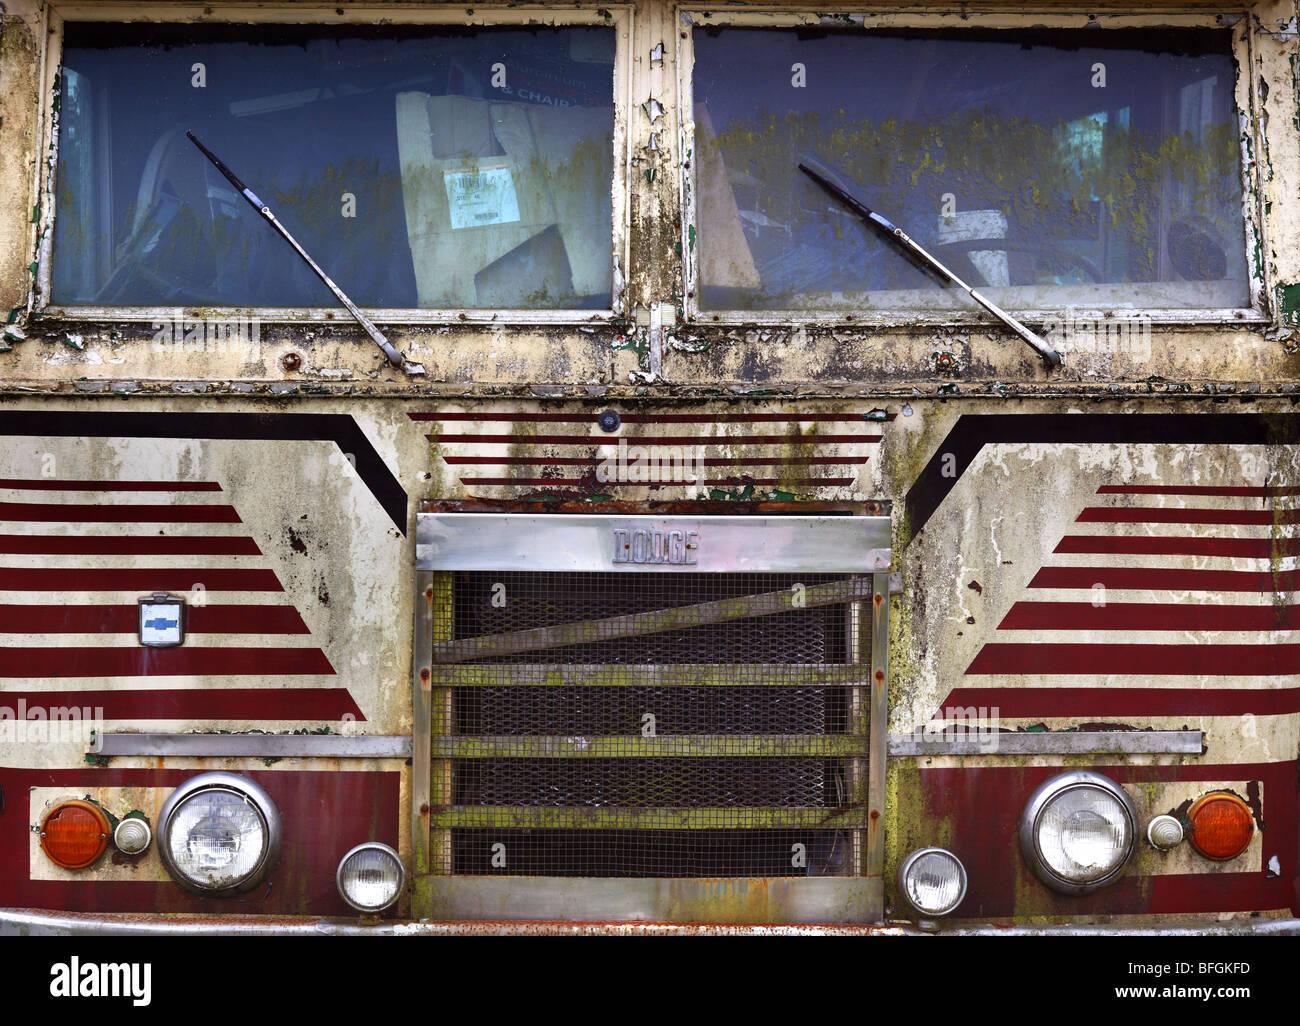 Old Winnebago motorhome past its best. - Stock Image